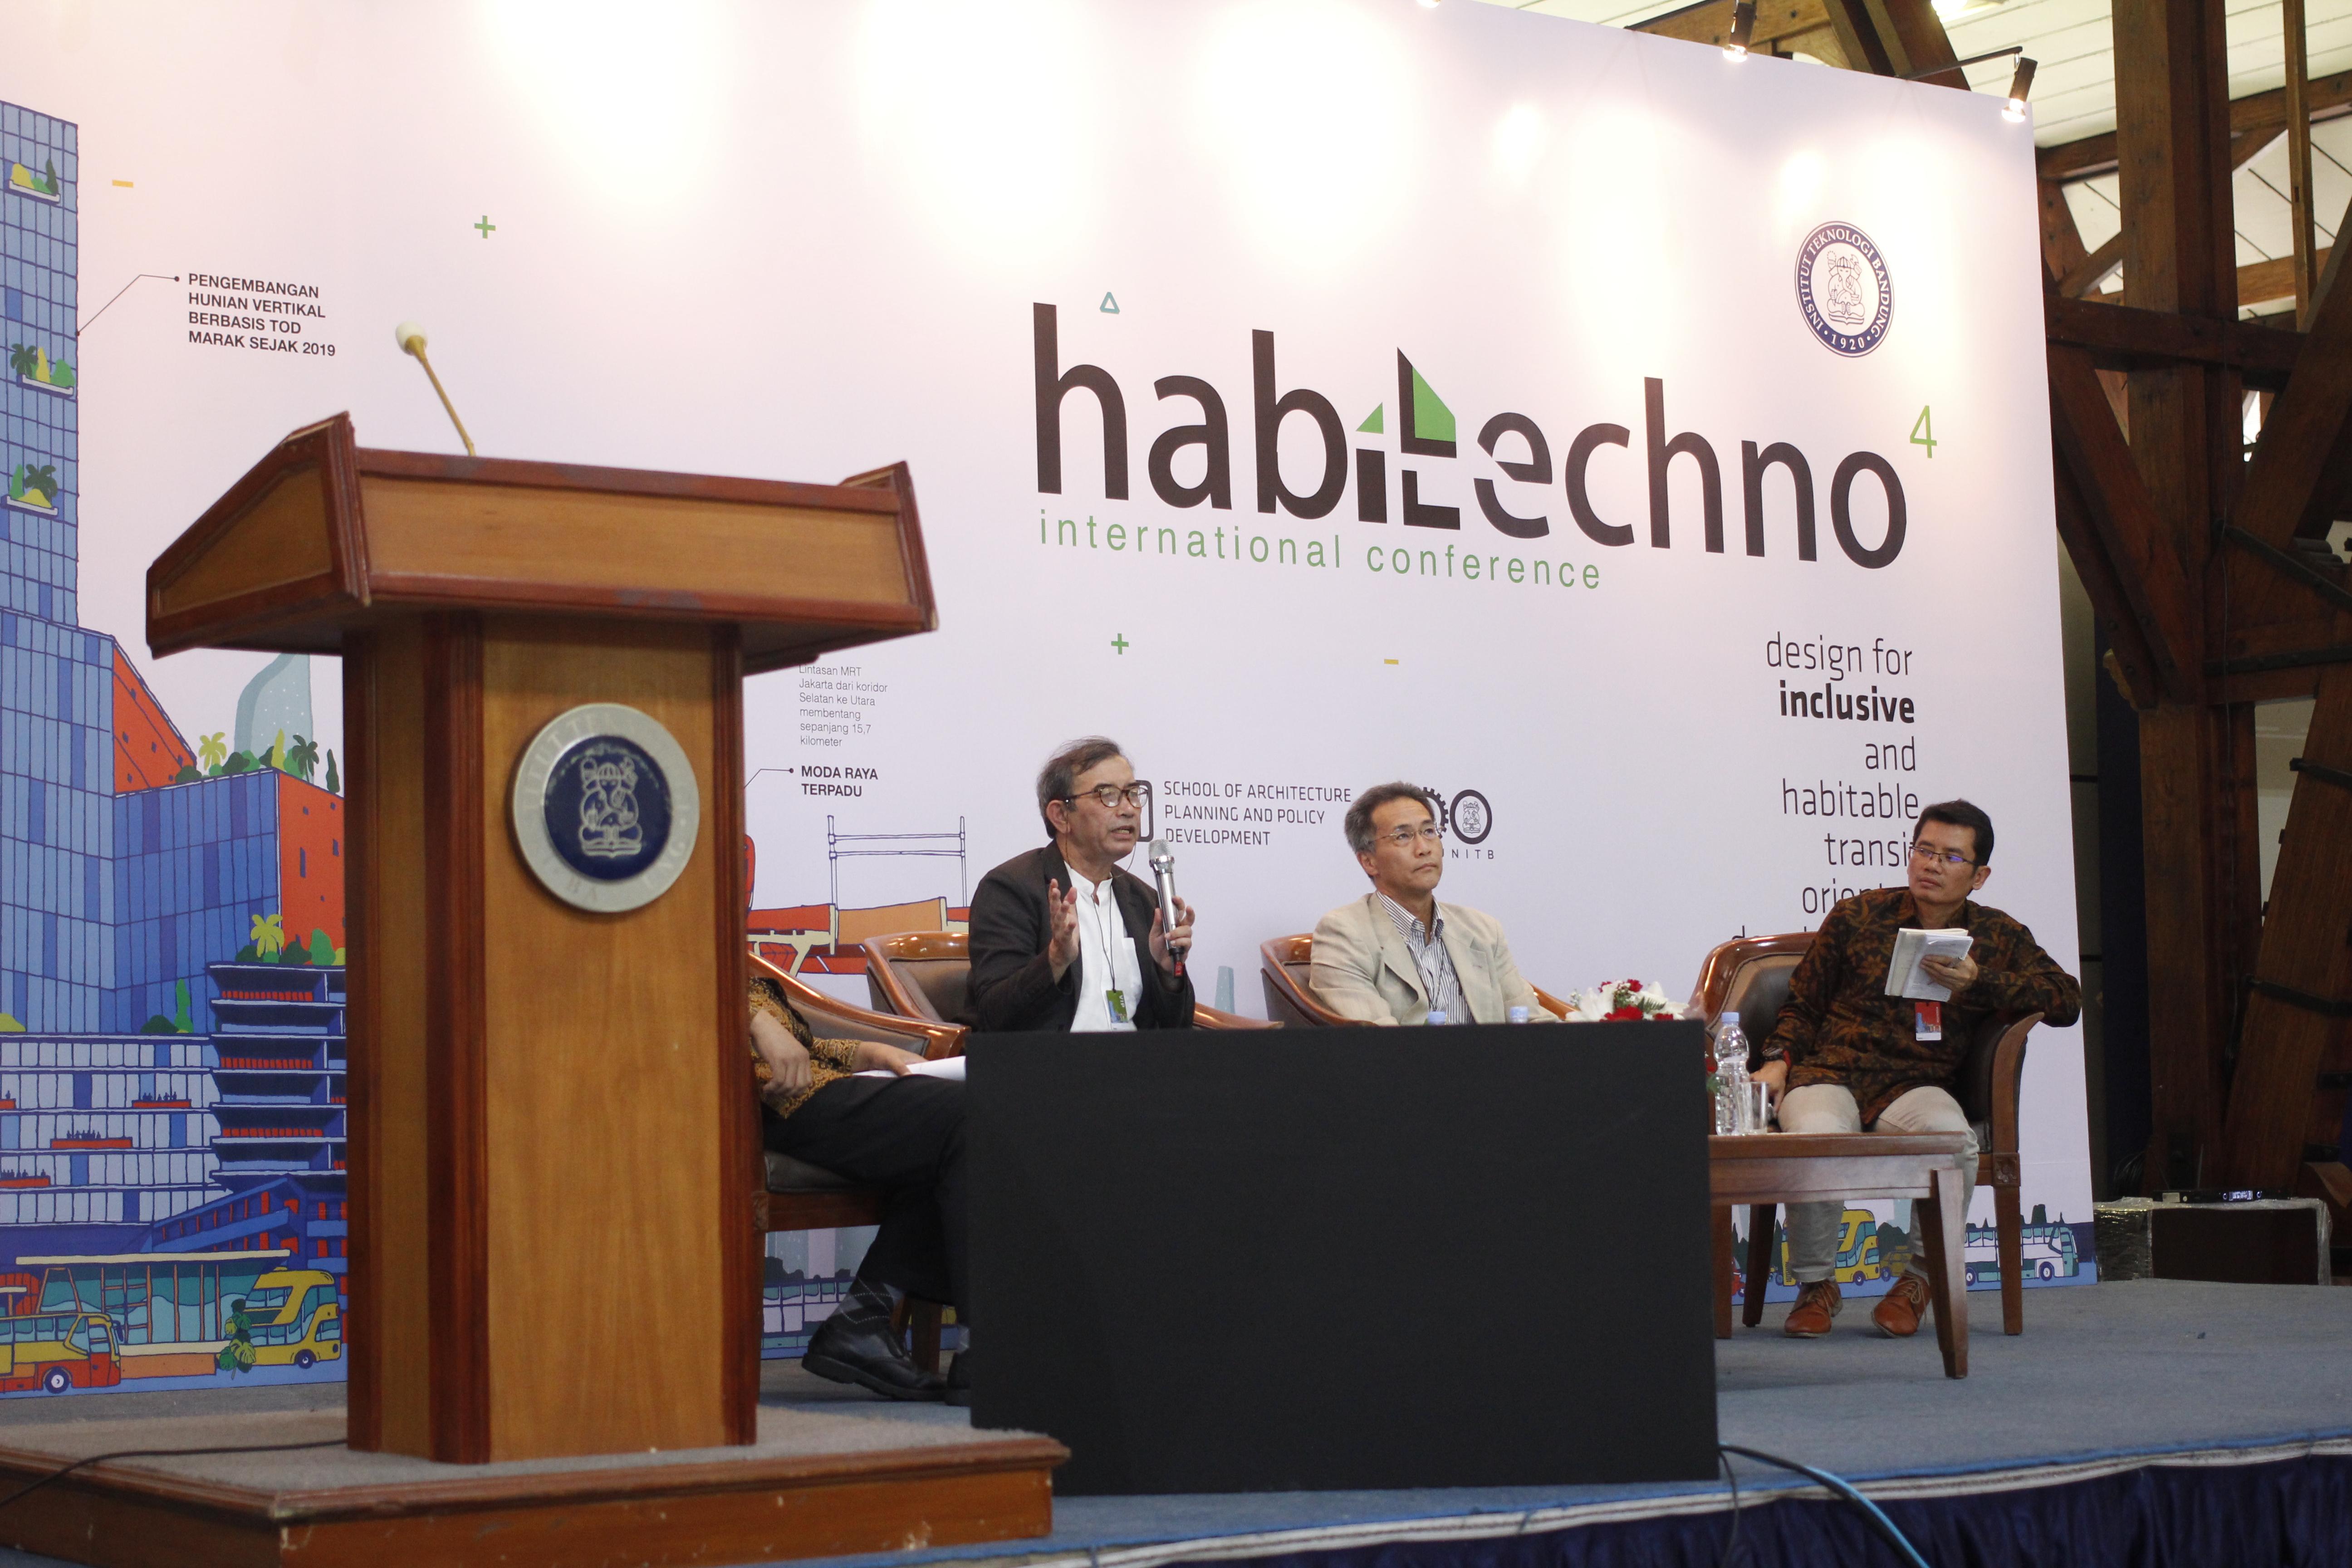 Habitechno 4 International Conference 16 November 2019